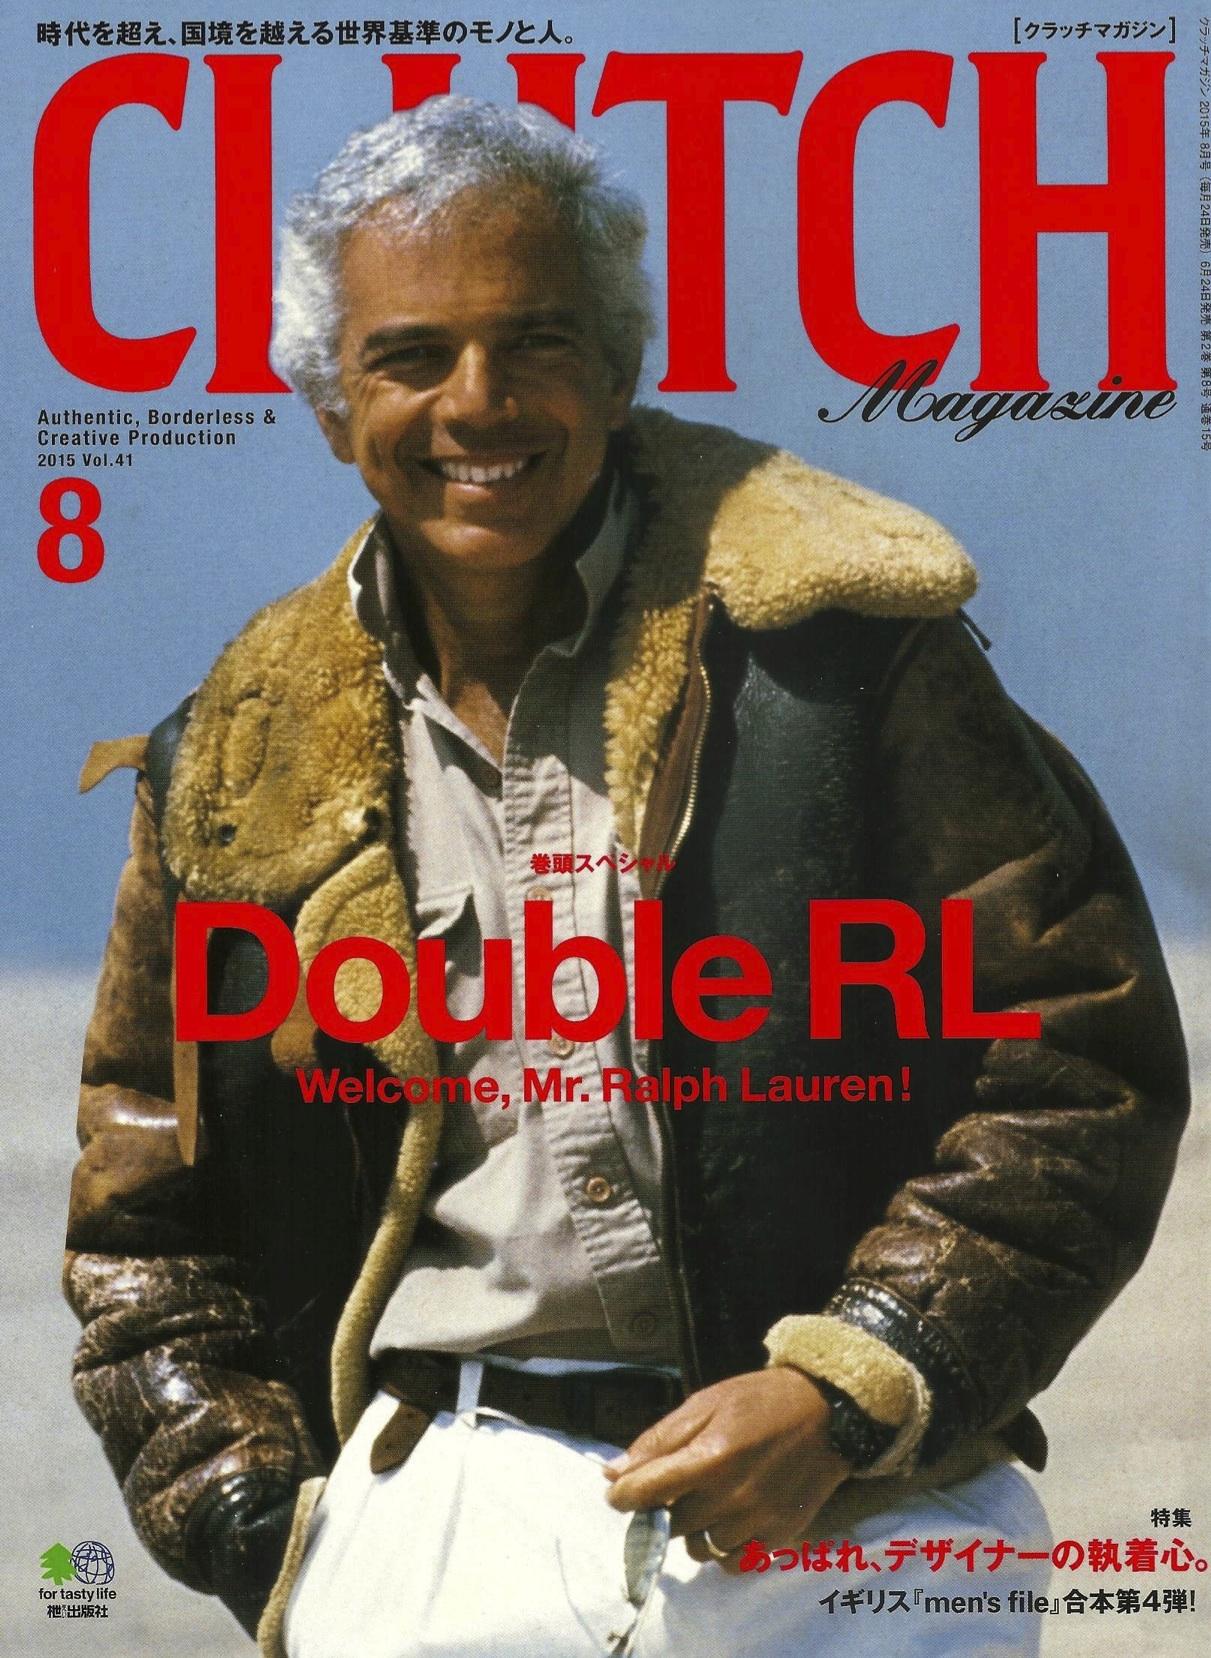 Clutch Vol 41-1 .jpg